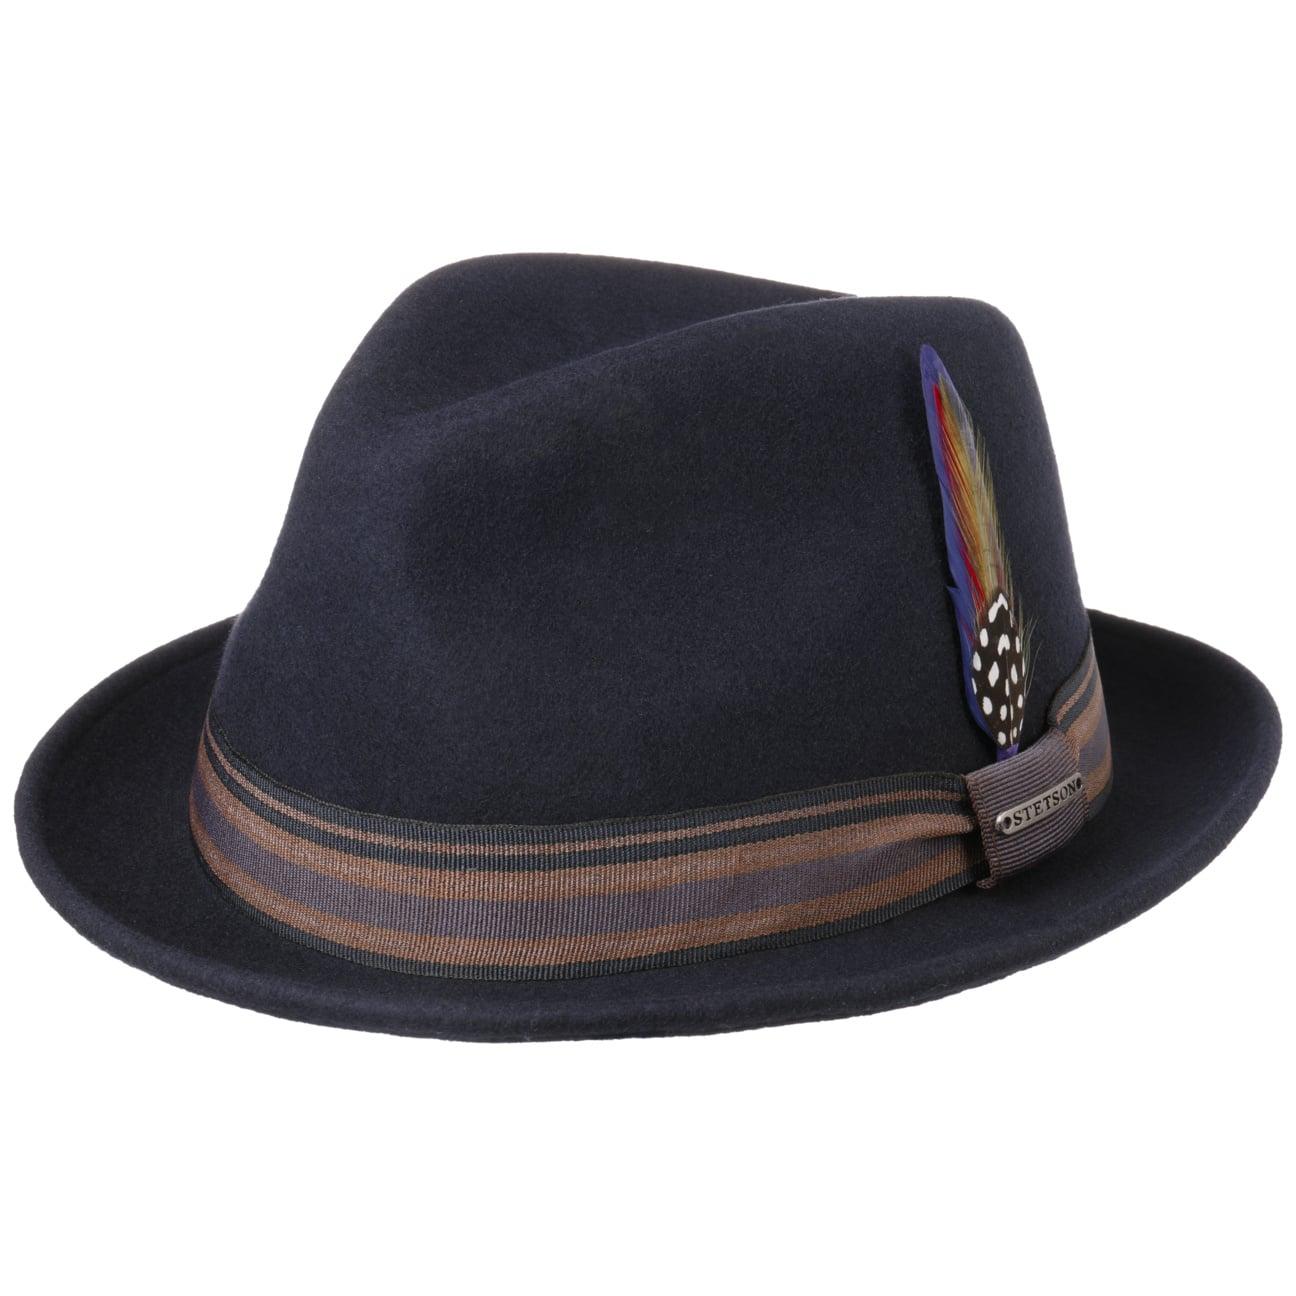 05d3a819e3e ... Oneida Snap Brim Trilby Hat by Stetson - blue 6 ...